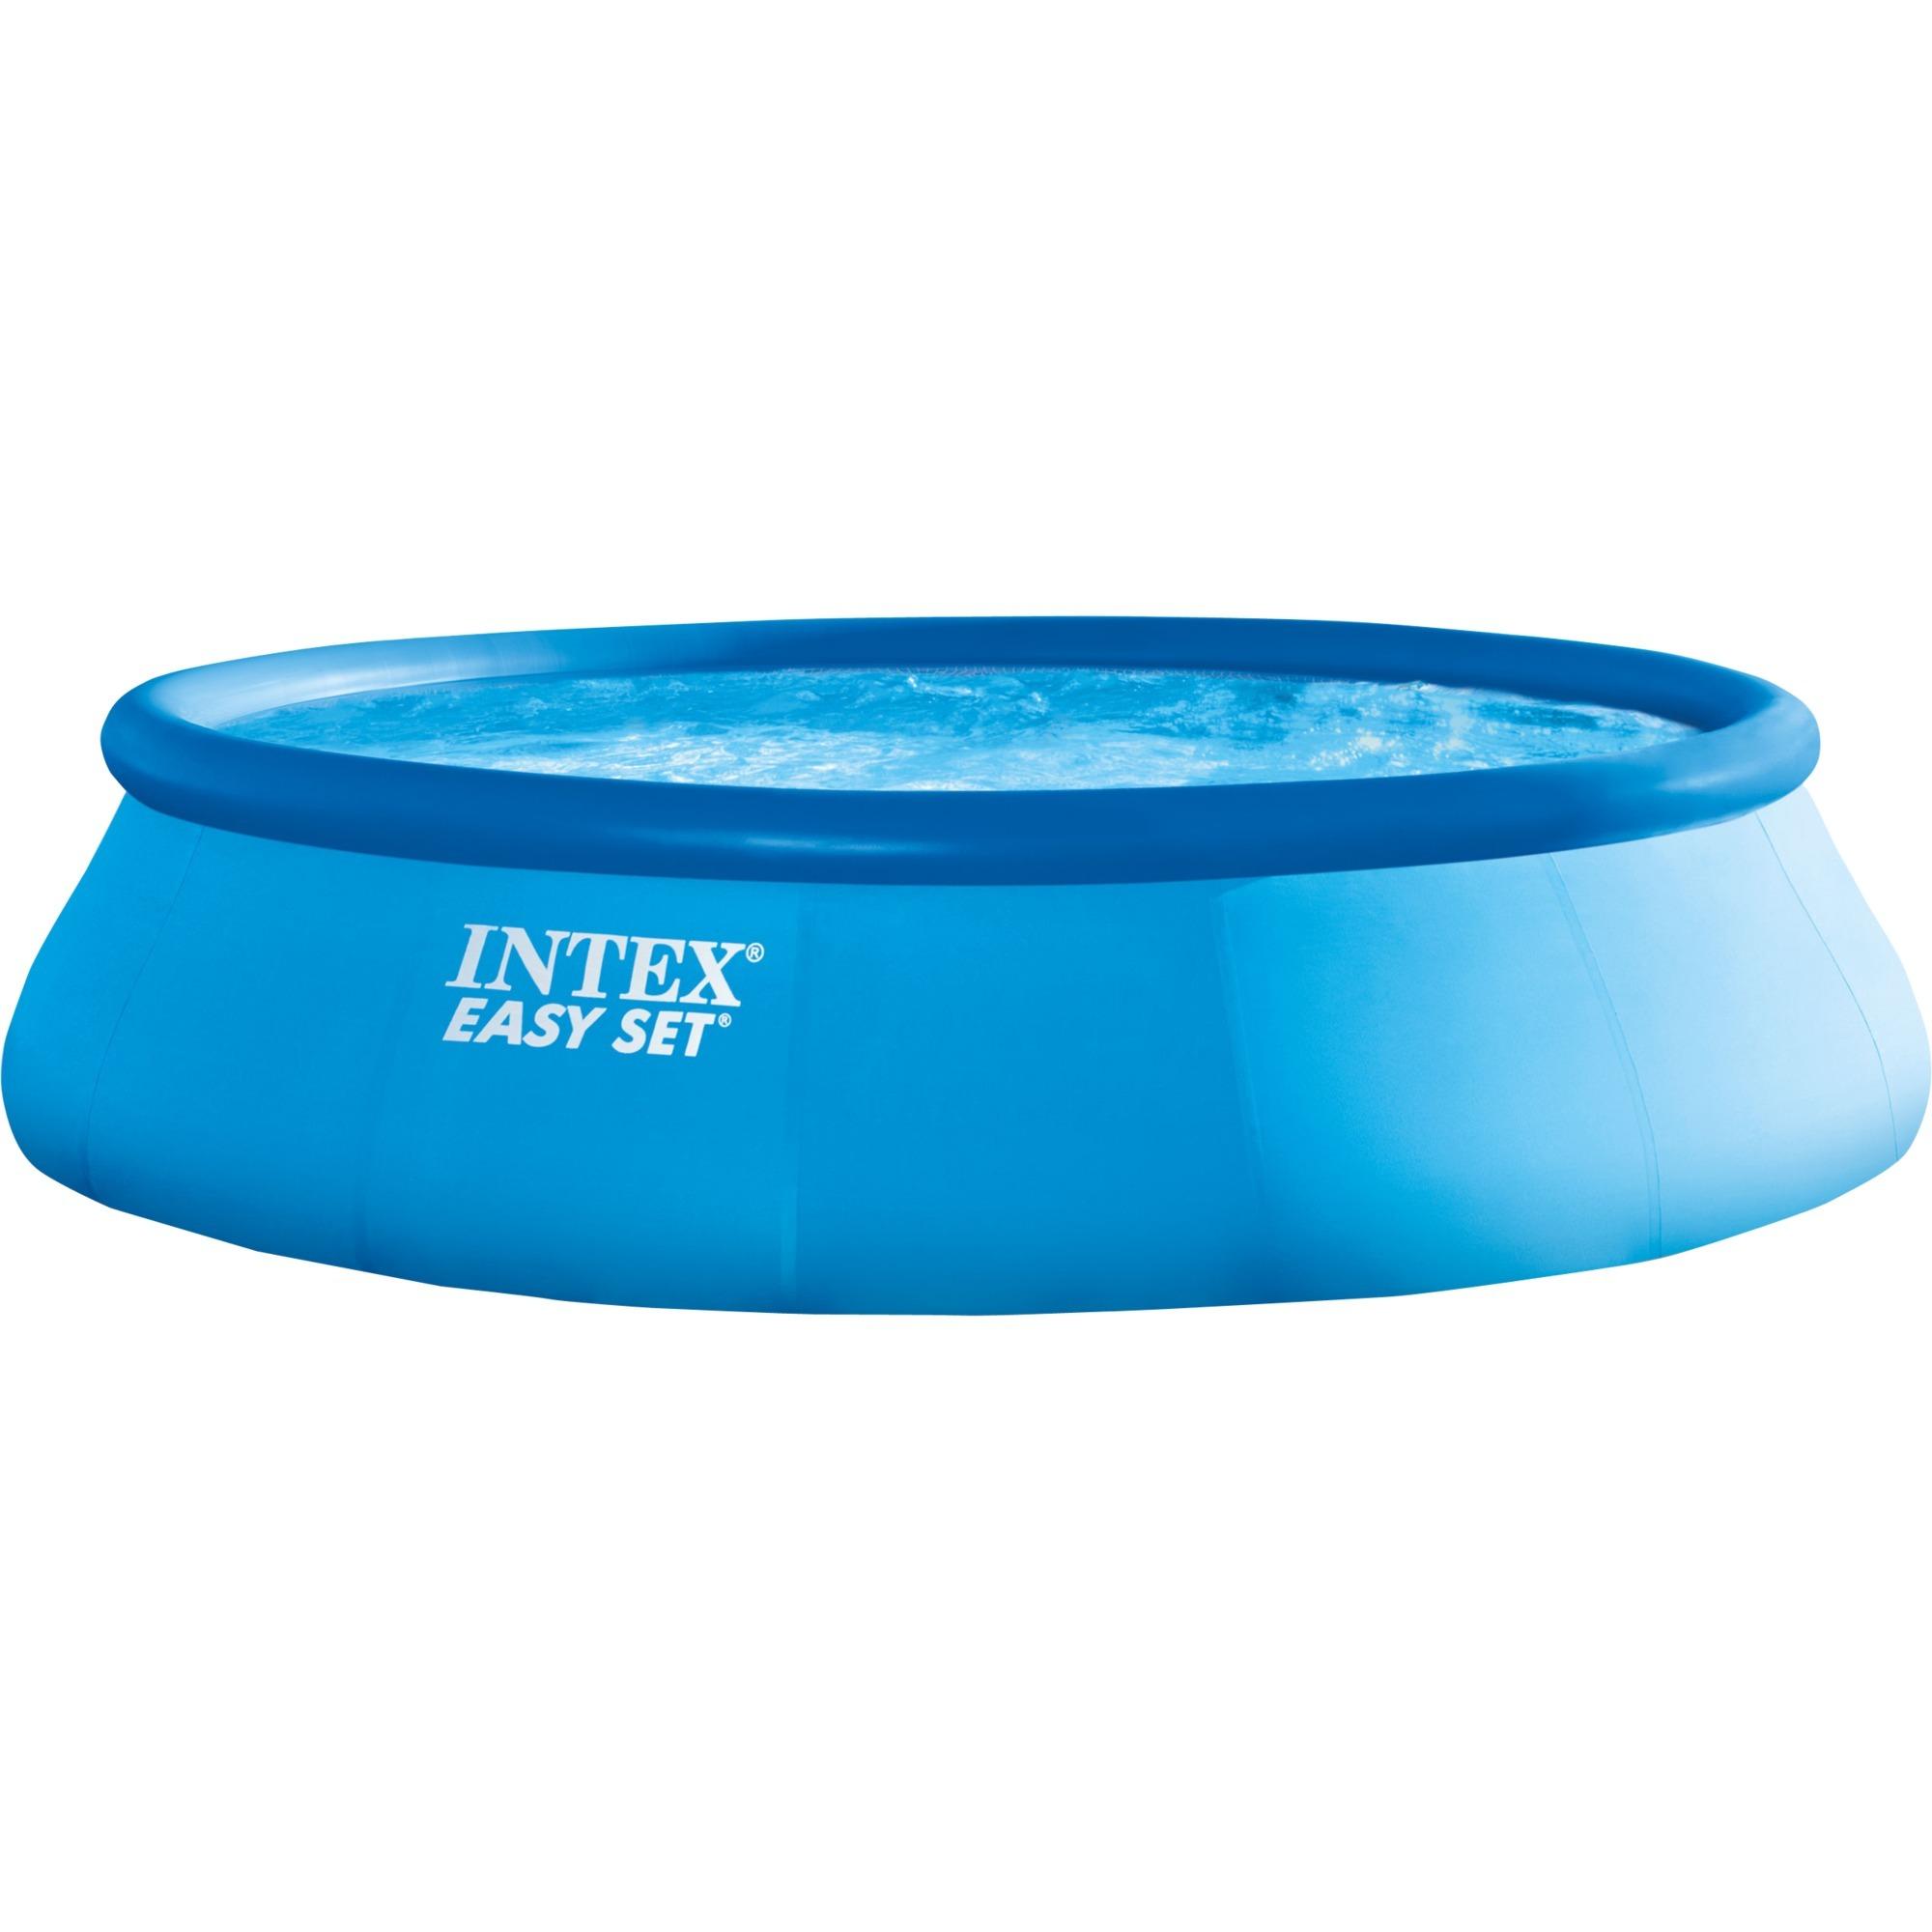 2816-inflatable-pool-round-pool-14142l-blaa-swimming-pool